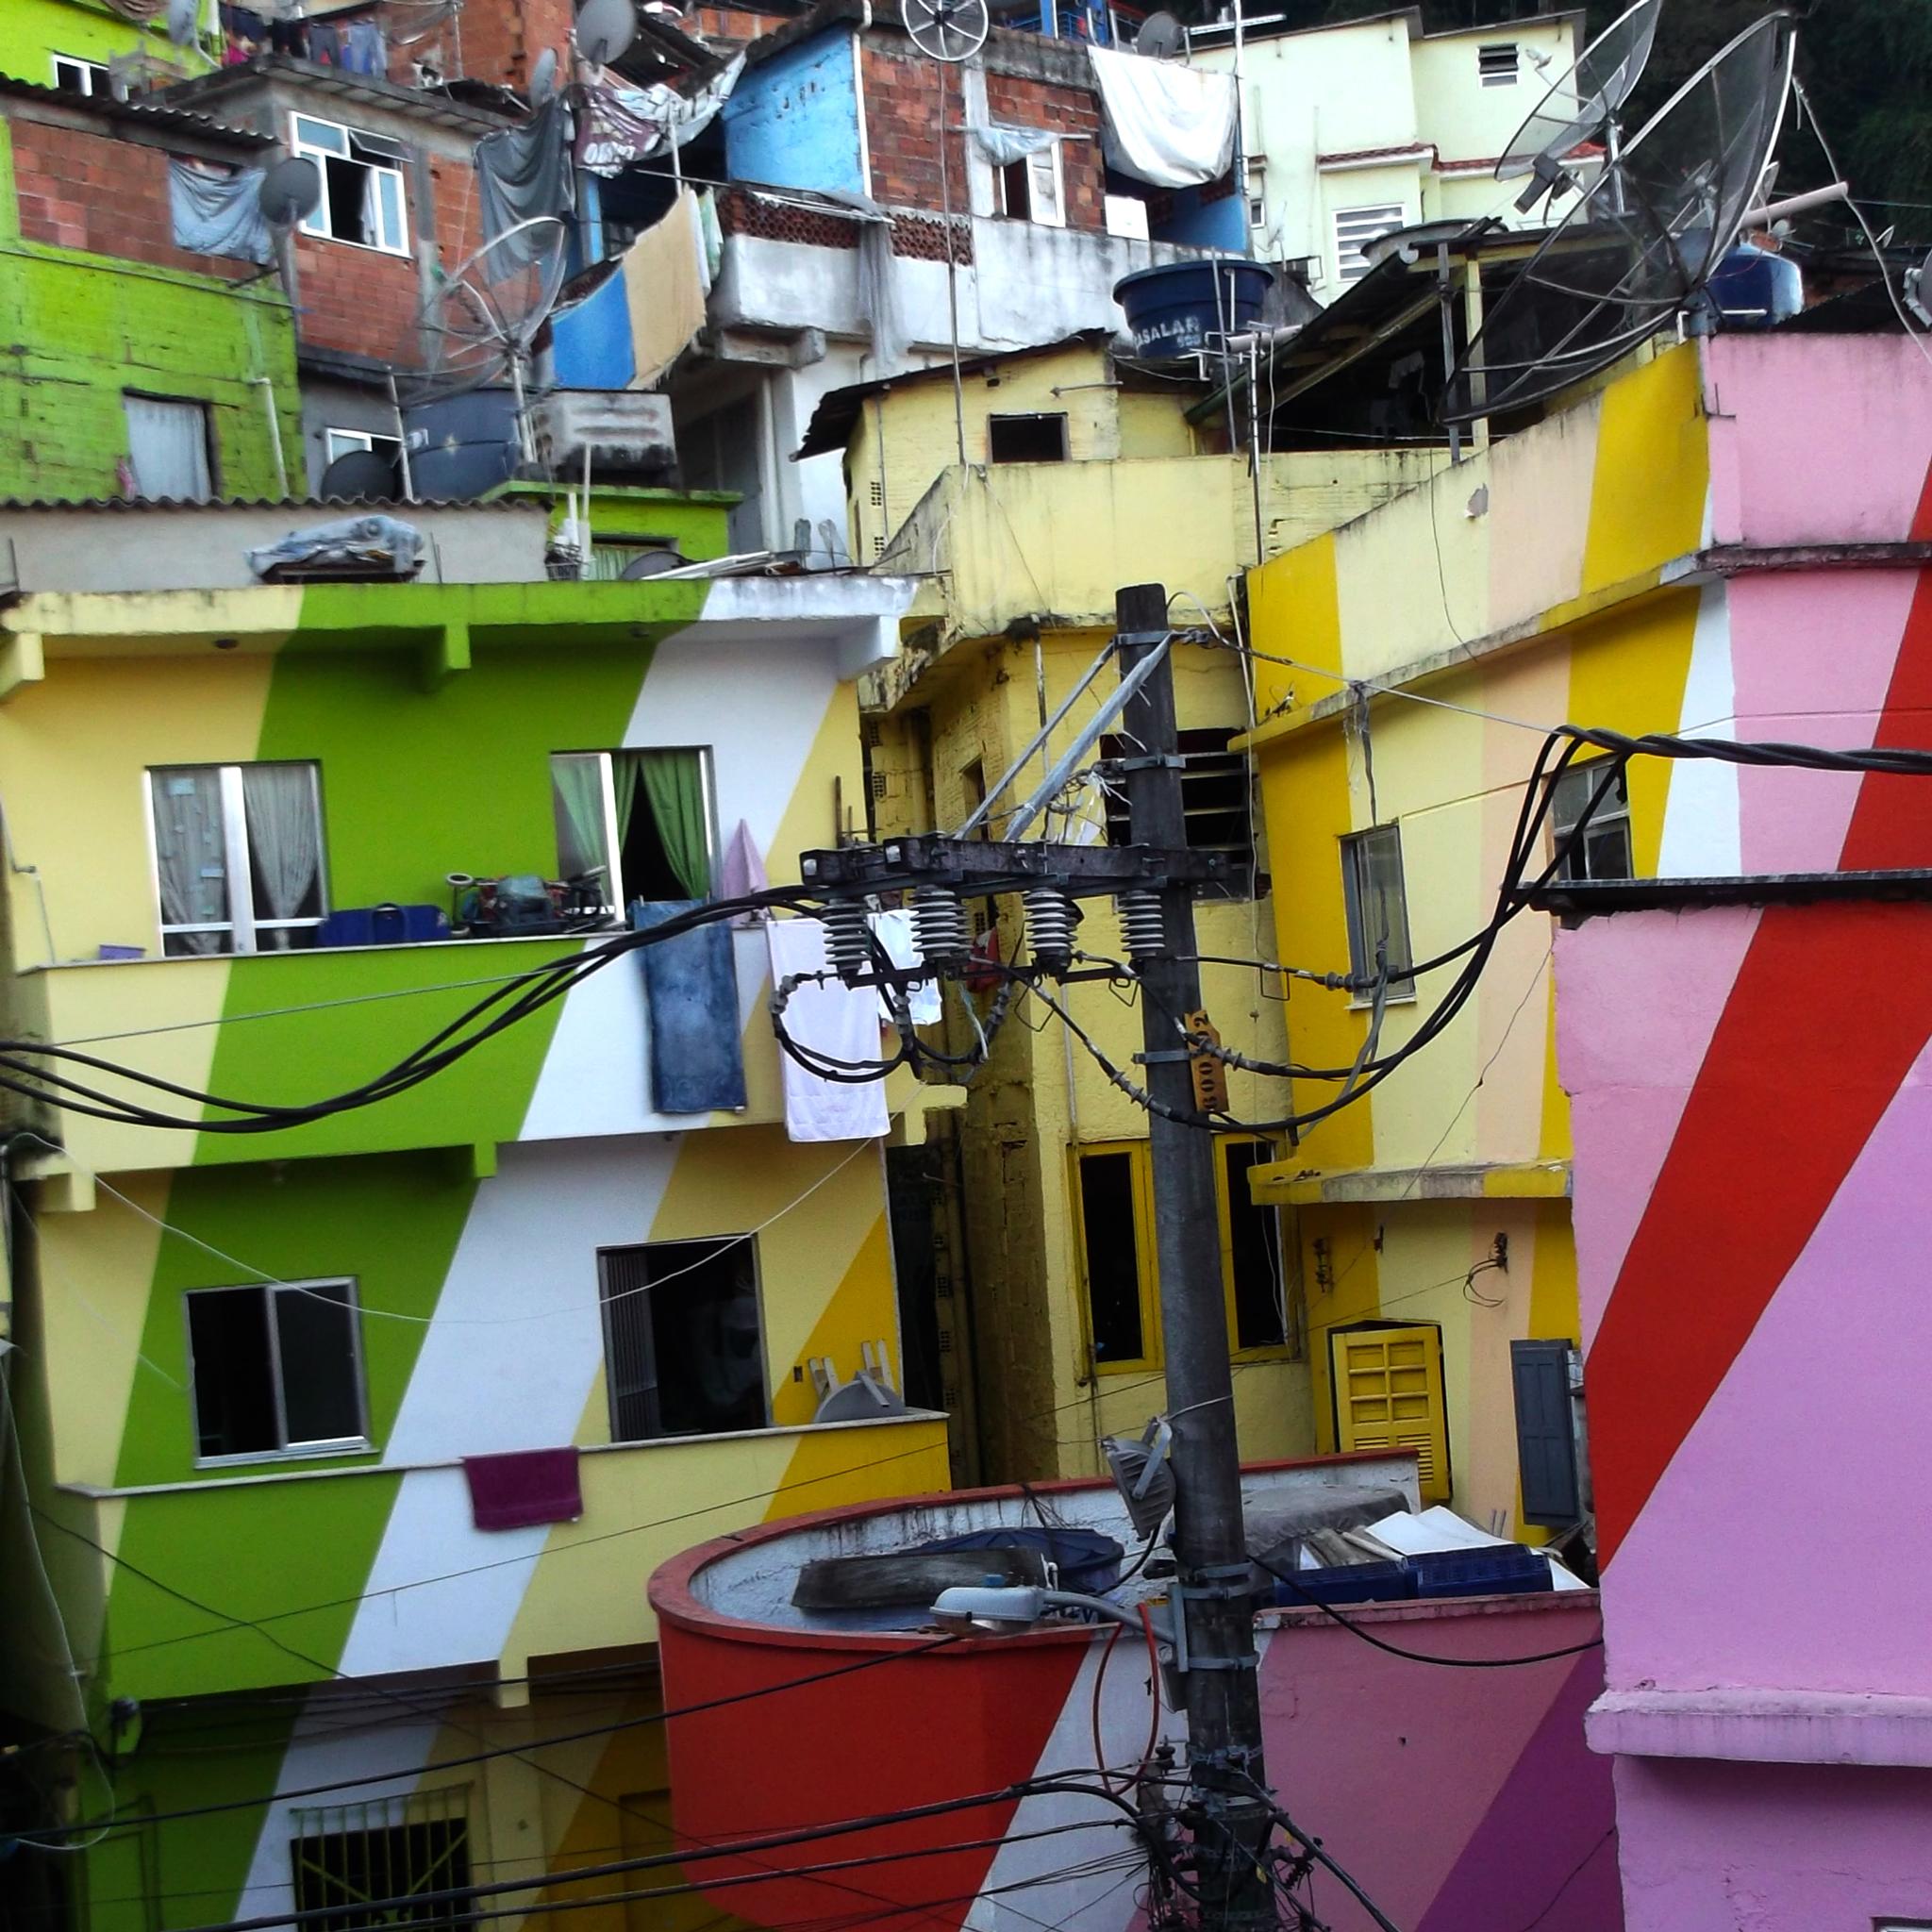 Ghetto Brasil 3Wallpapers iPad Retina Ghetto Brasil   iPad Retina